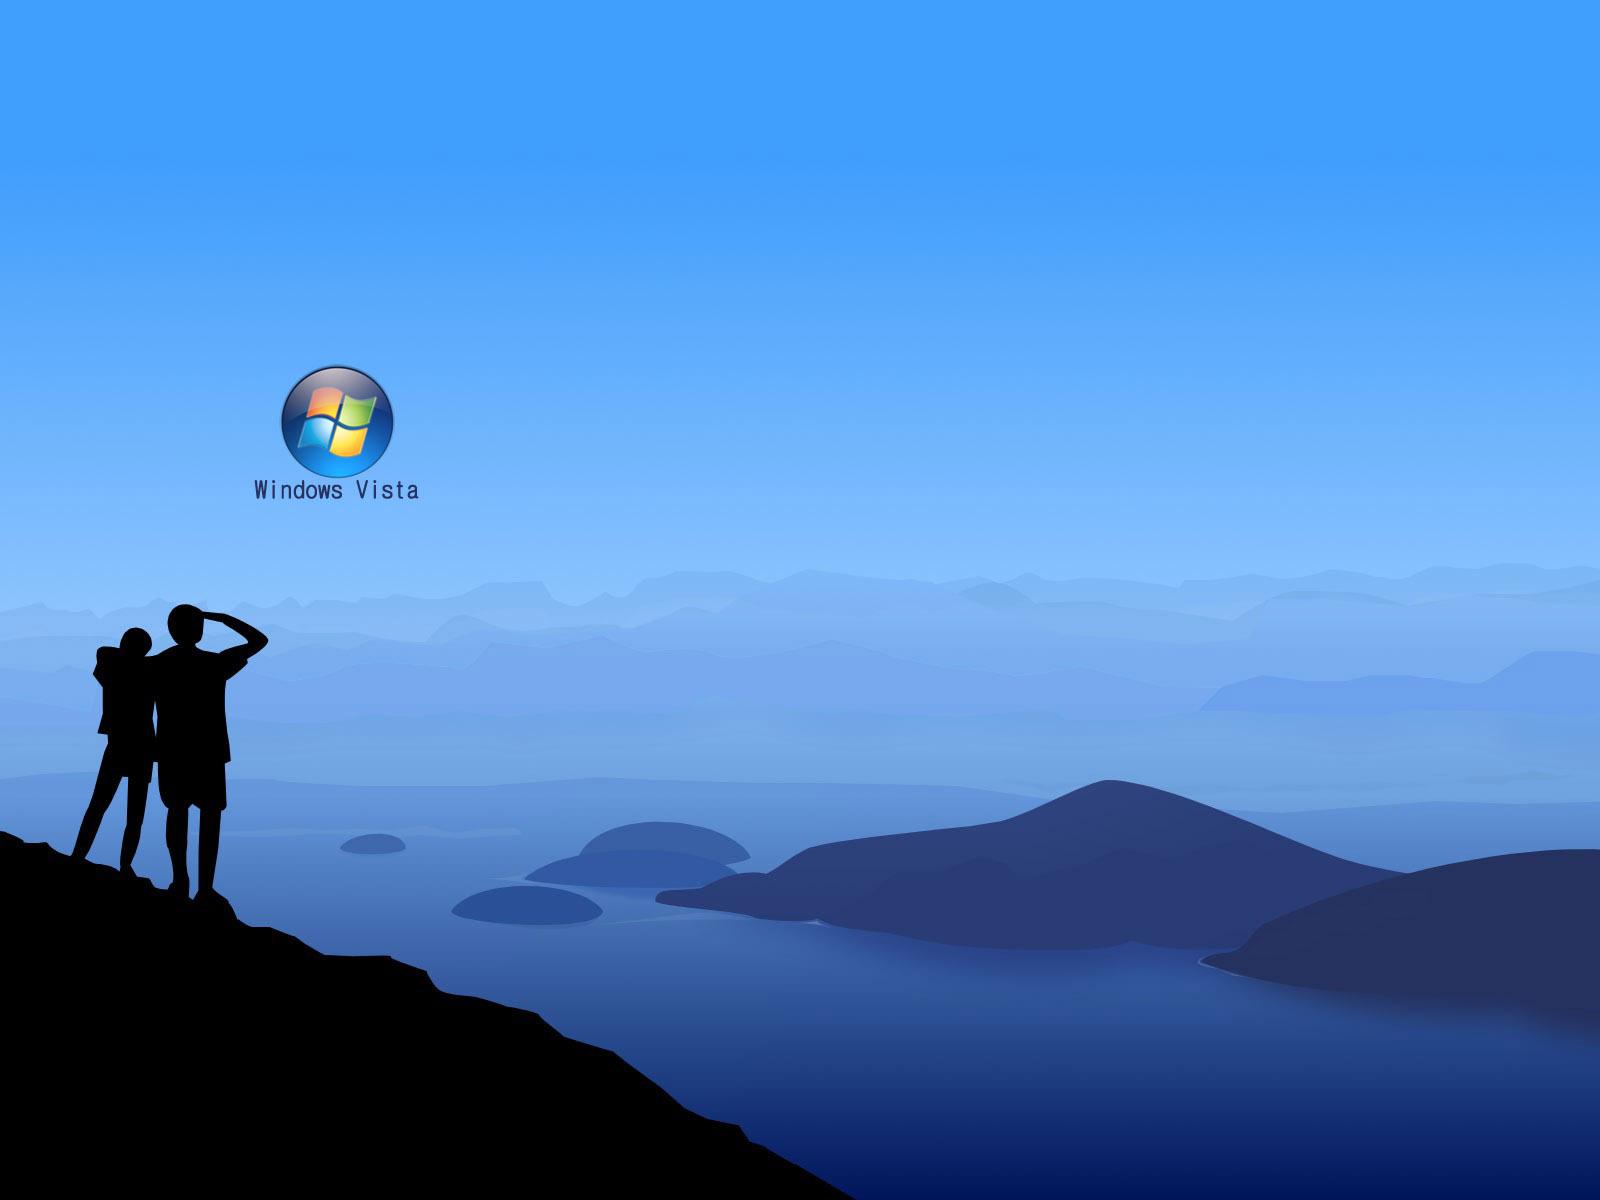 Windows Vista 壁紙 - Windows Vista WALLPAPER